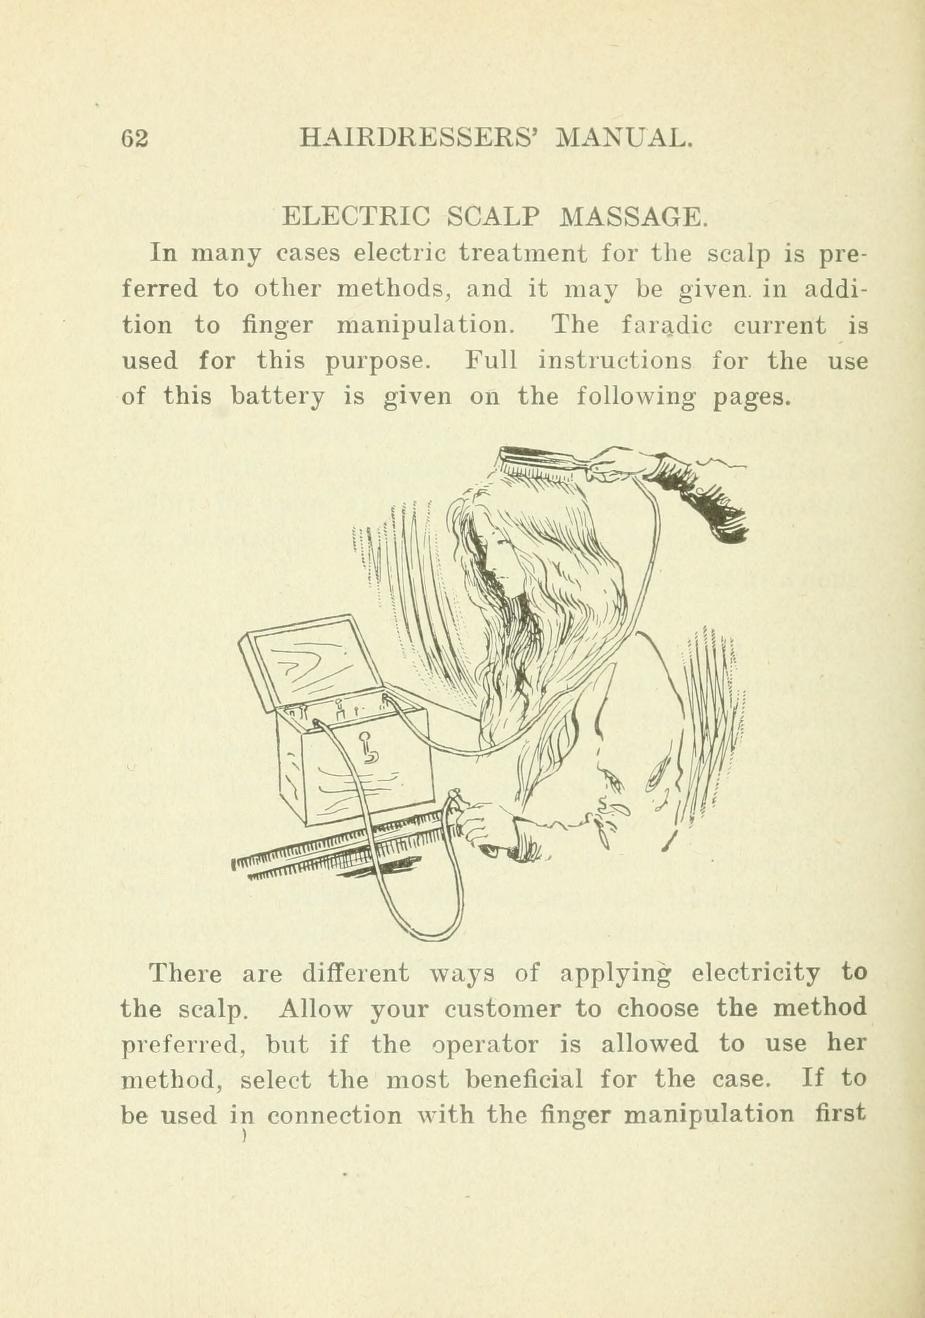 1906 Electric scalp massage